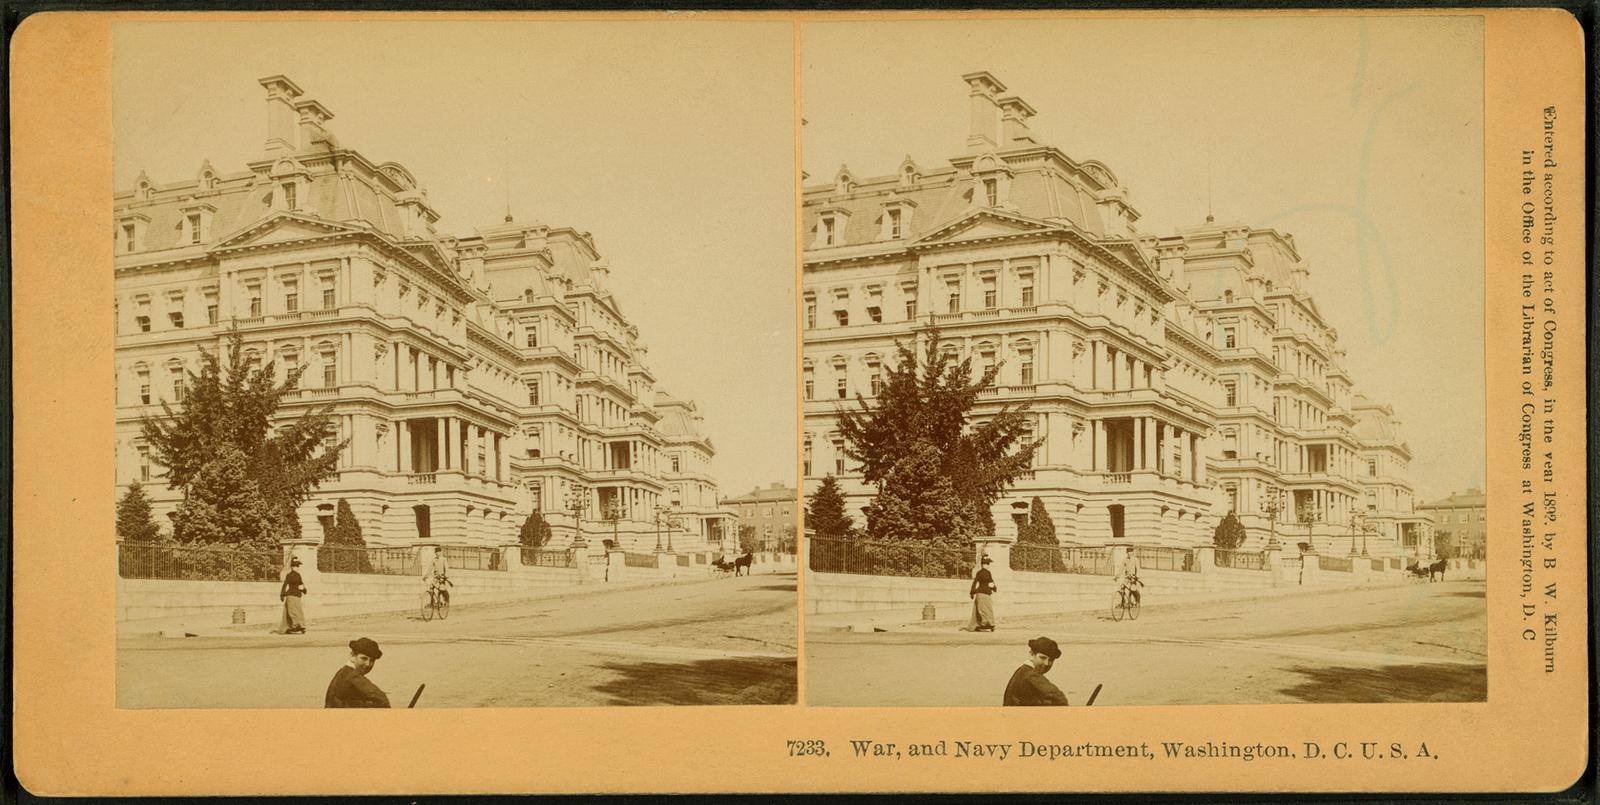 War and Navy Department, Washington, D.C., U.S.A..